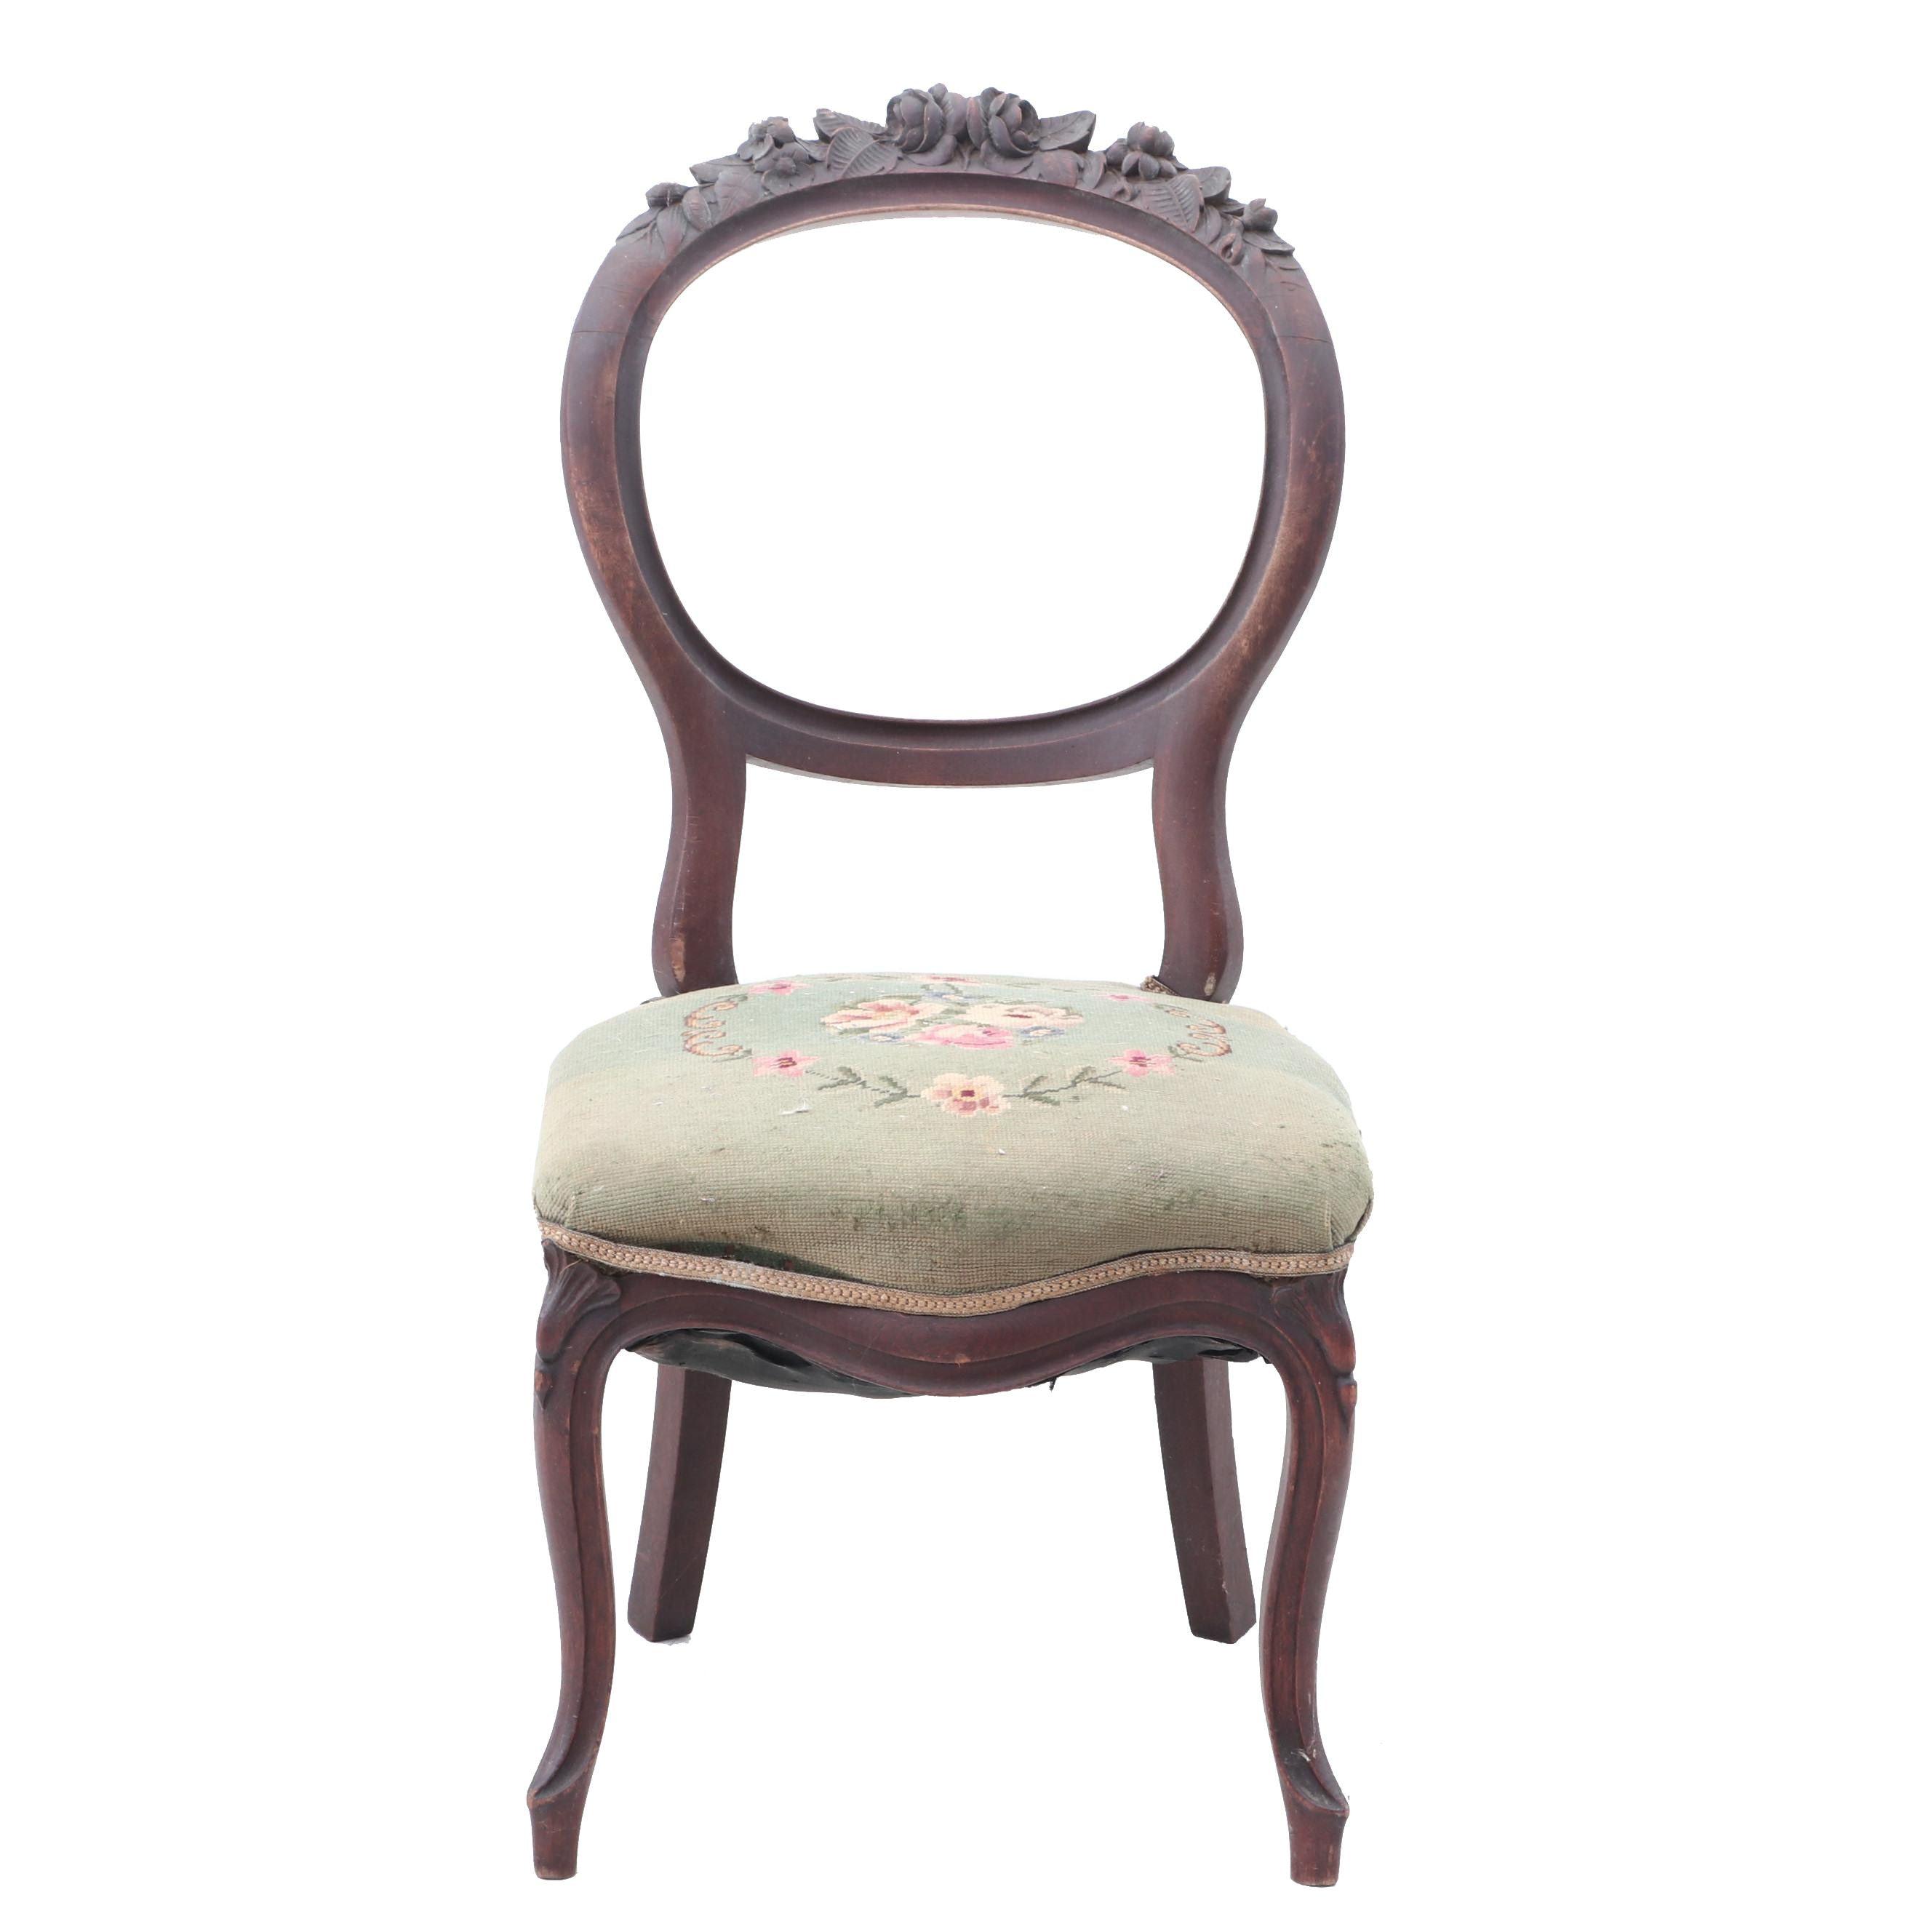 Victorian Carved Walnut Sidechair, circa 1860